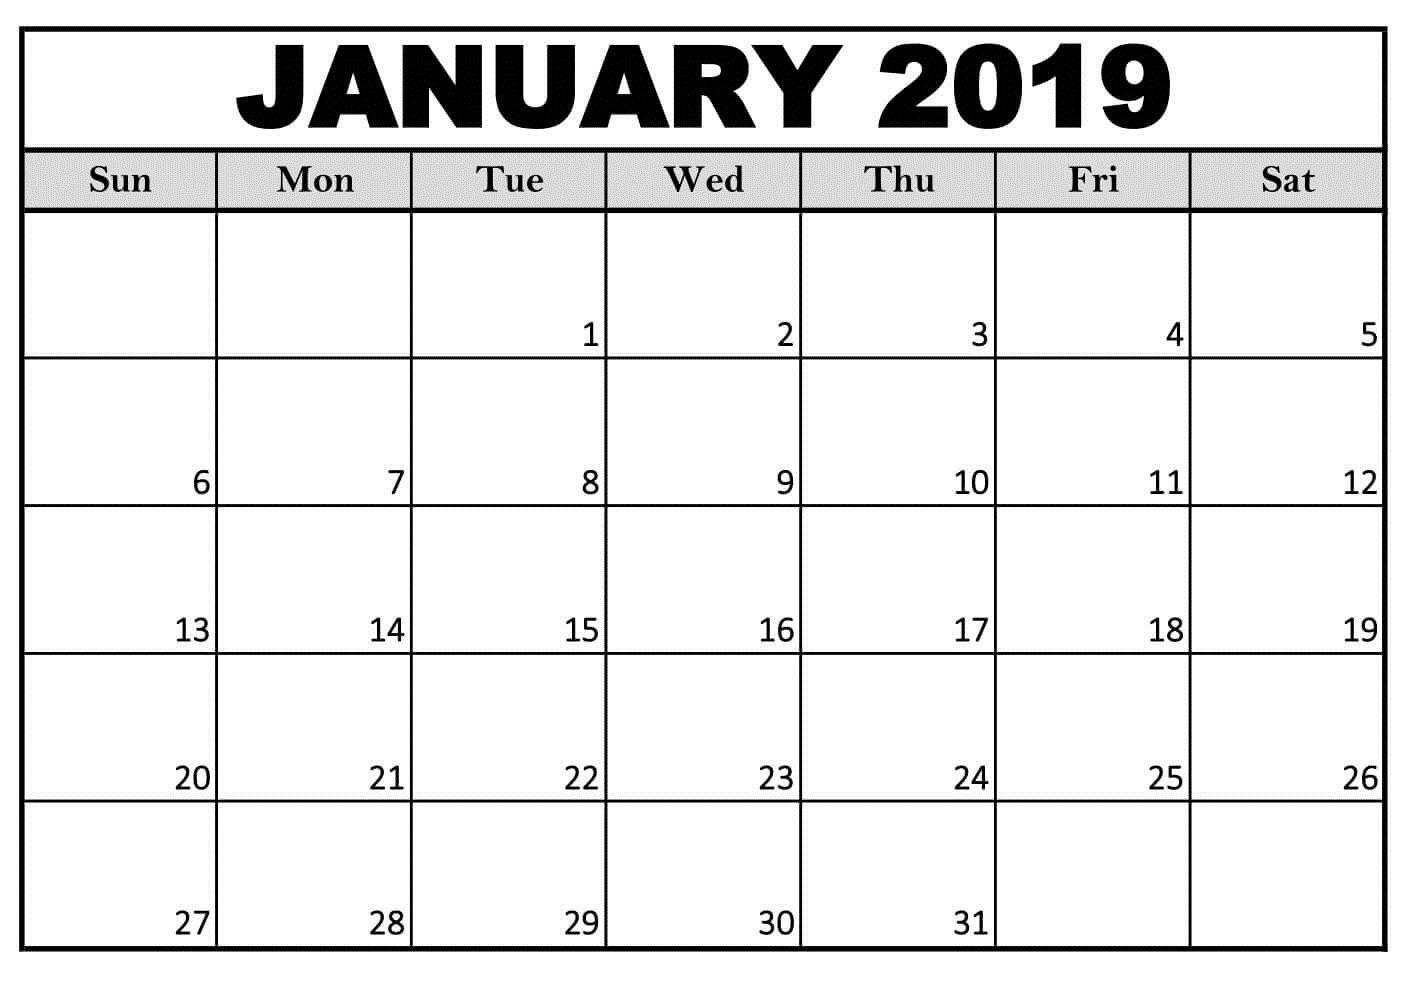 Printable January 2019 Calendar Decorative Free Printable February